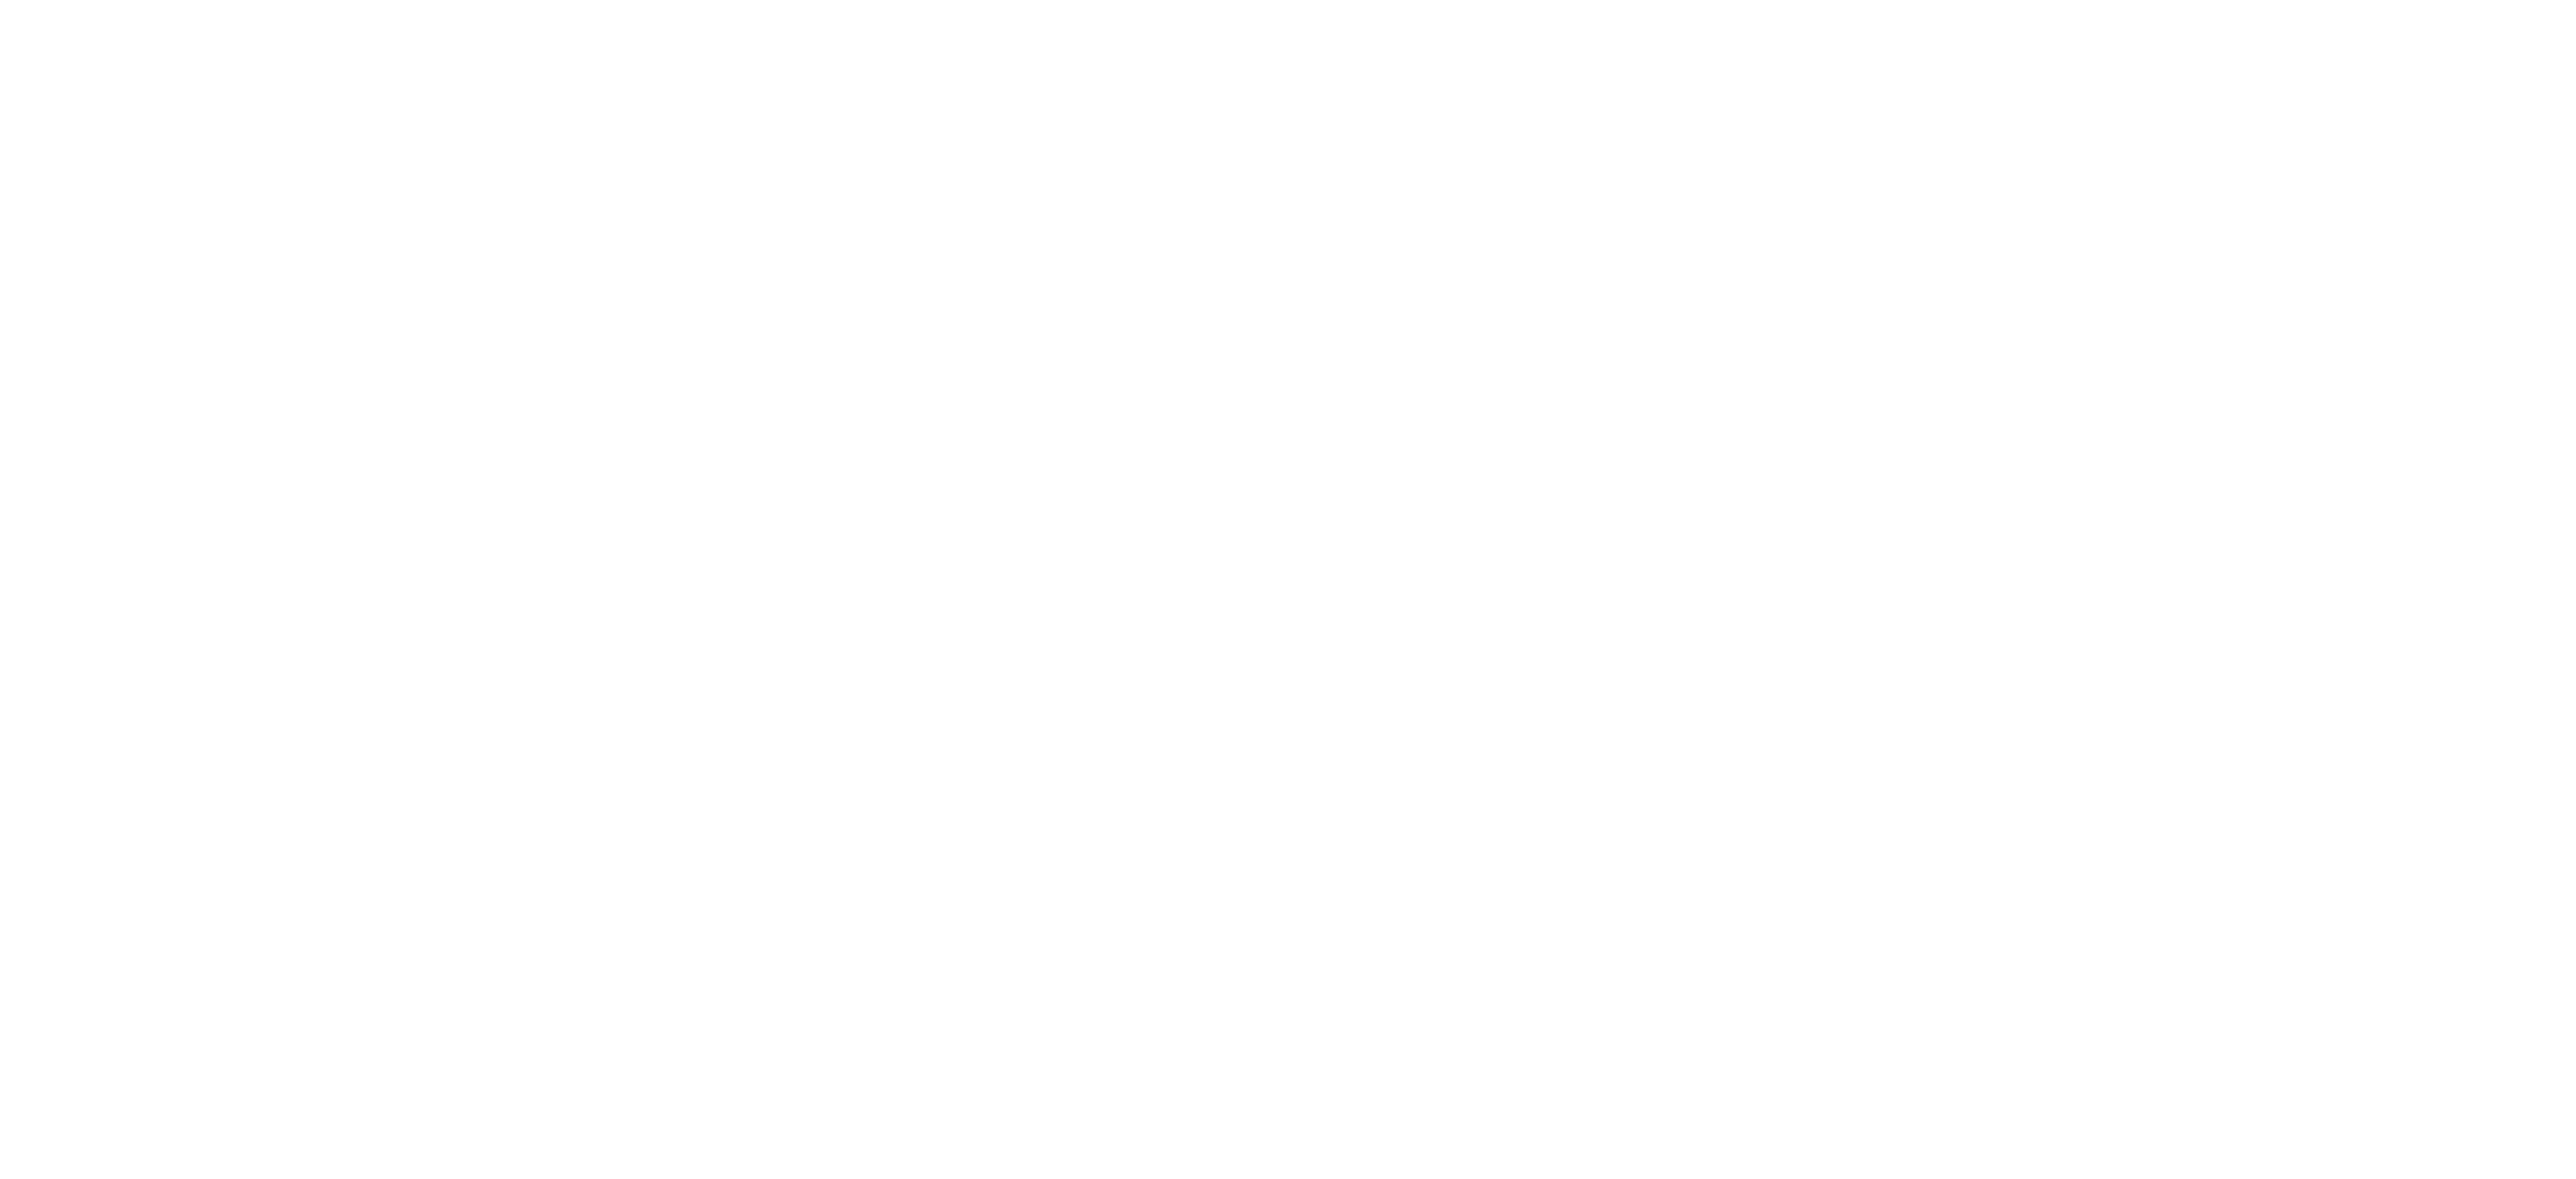 MrMxDzn